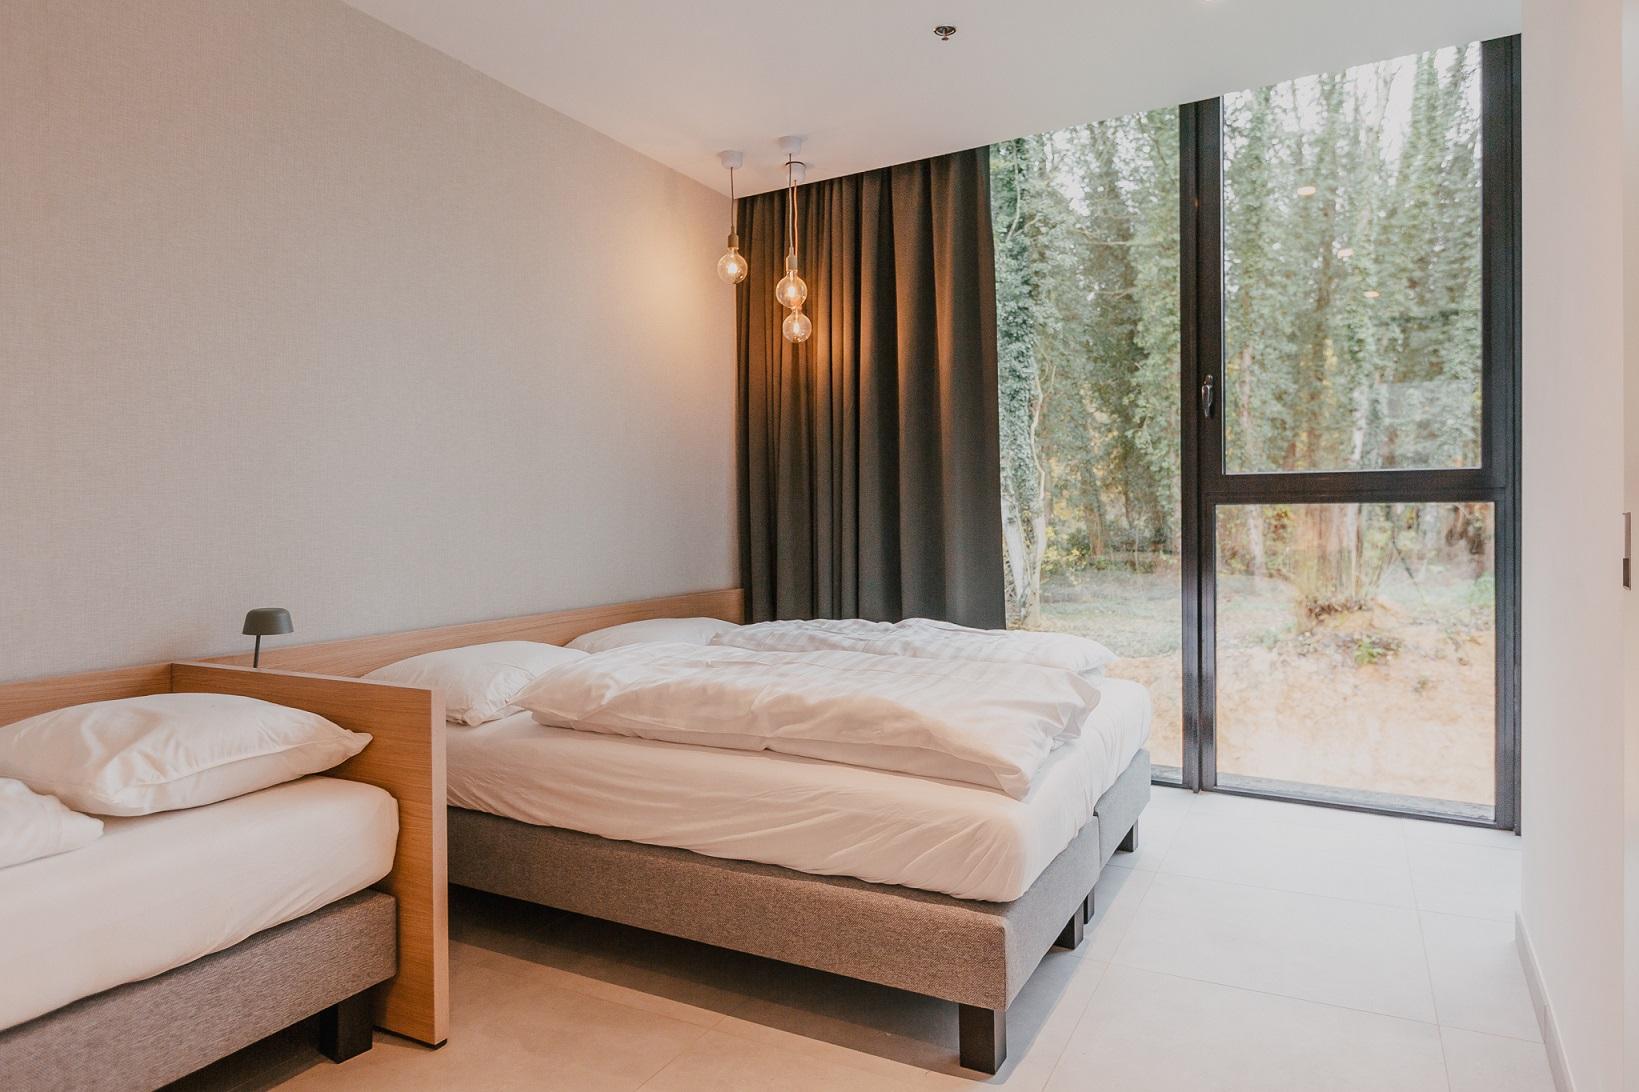 RonaldMcDonald-slaapkamer2.jpg